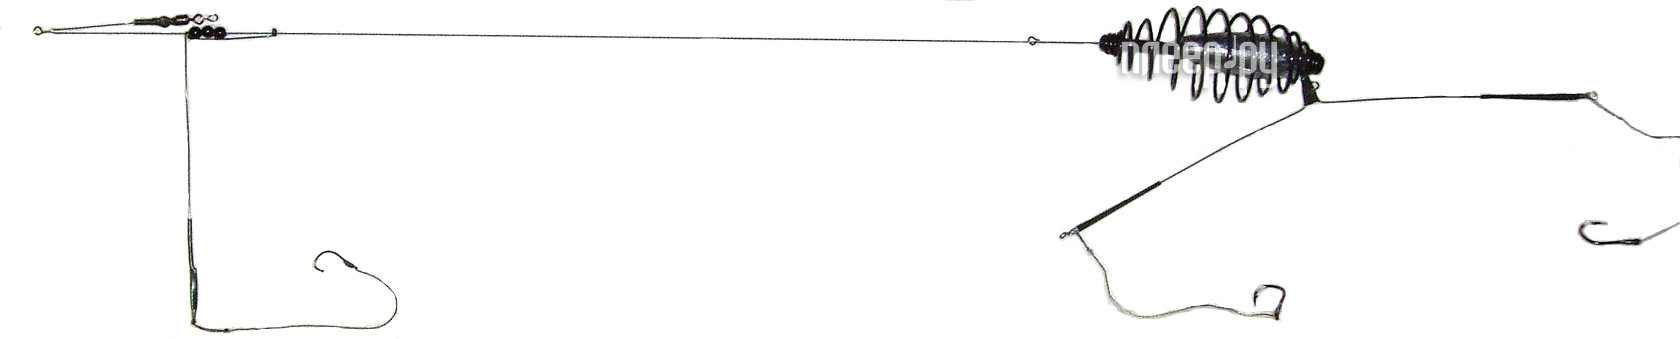 Кормушка Deepriver 35гр, крючок №8 OD-03-035-08